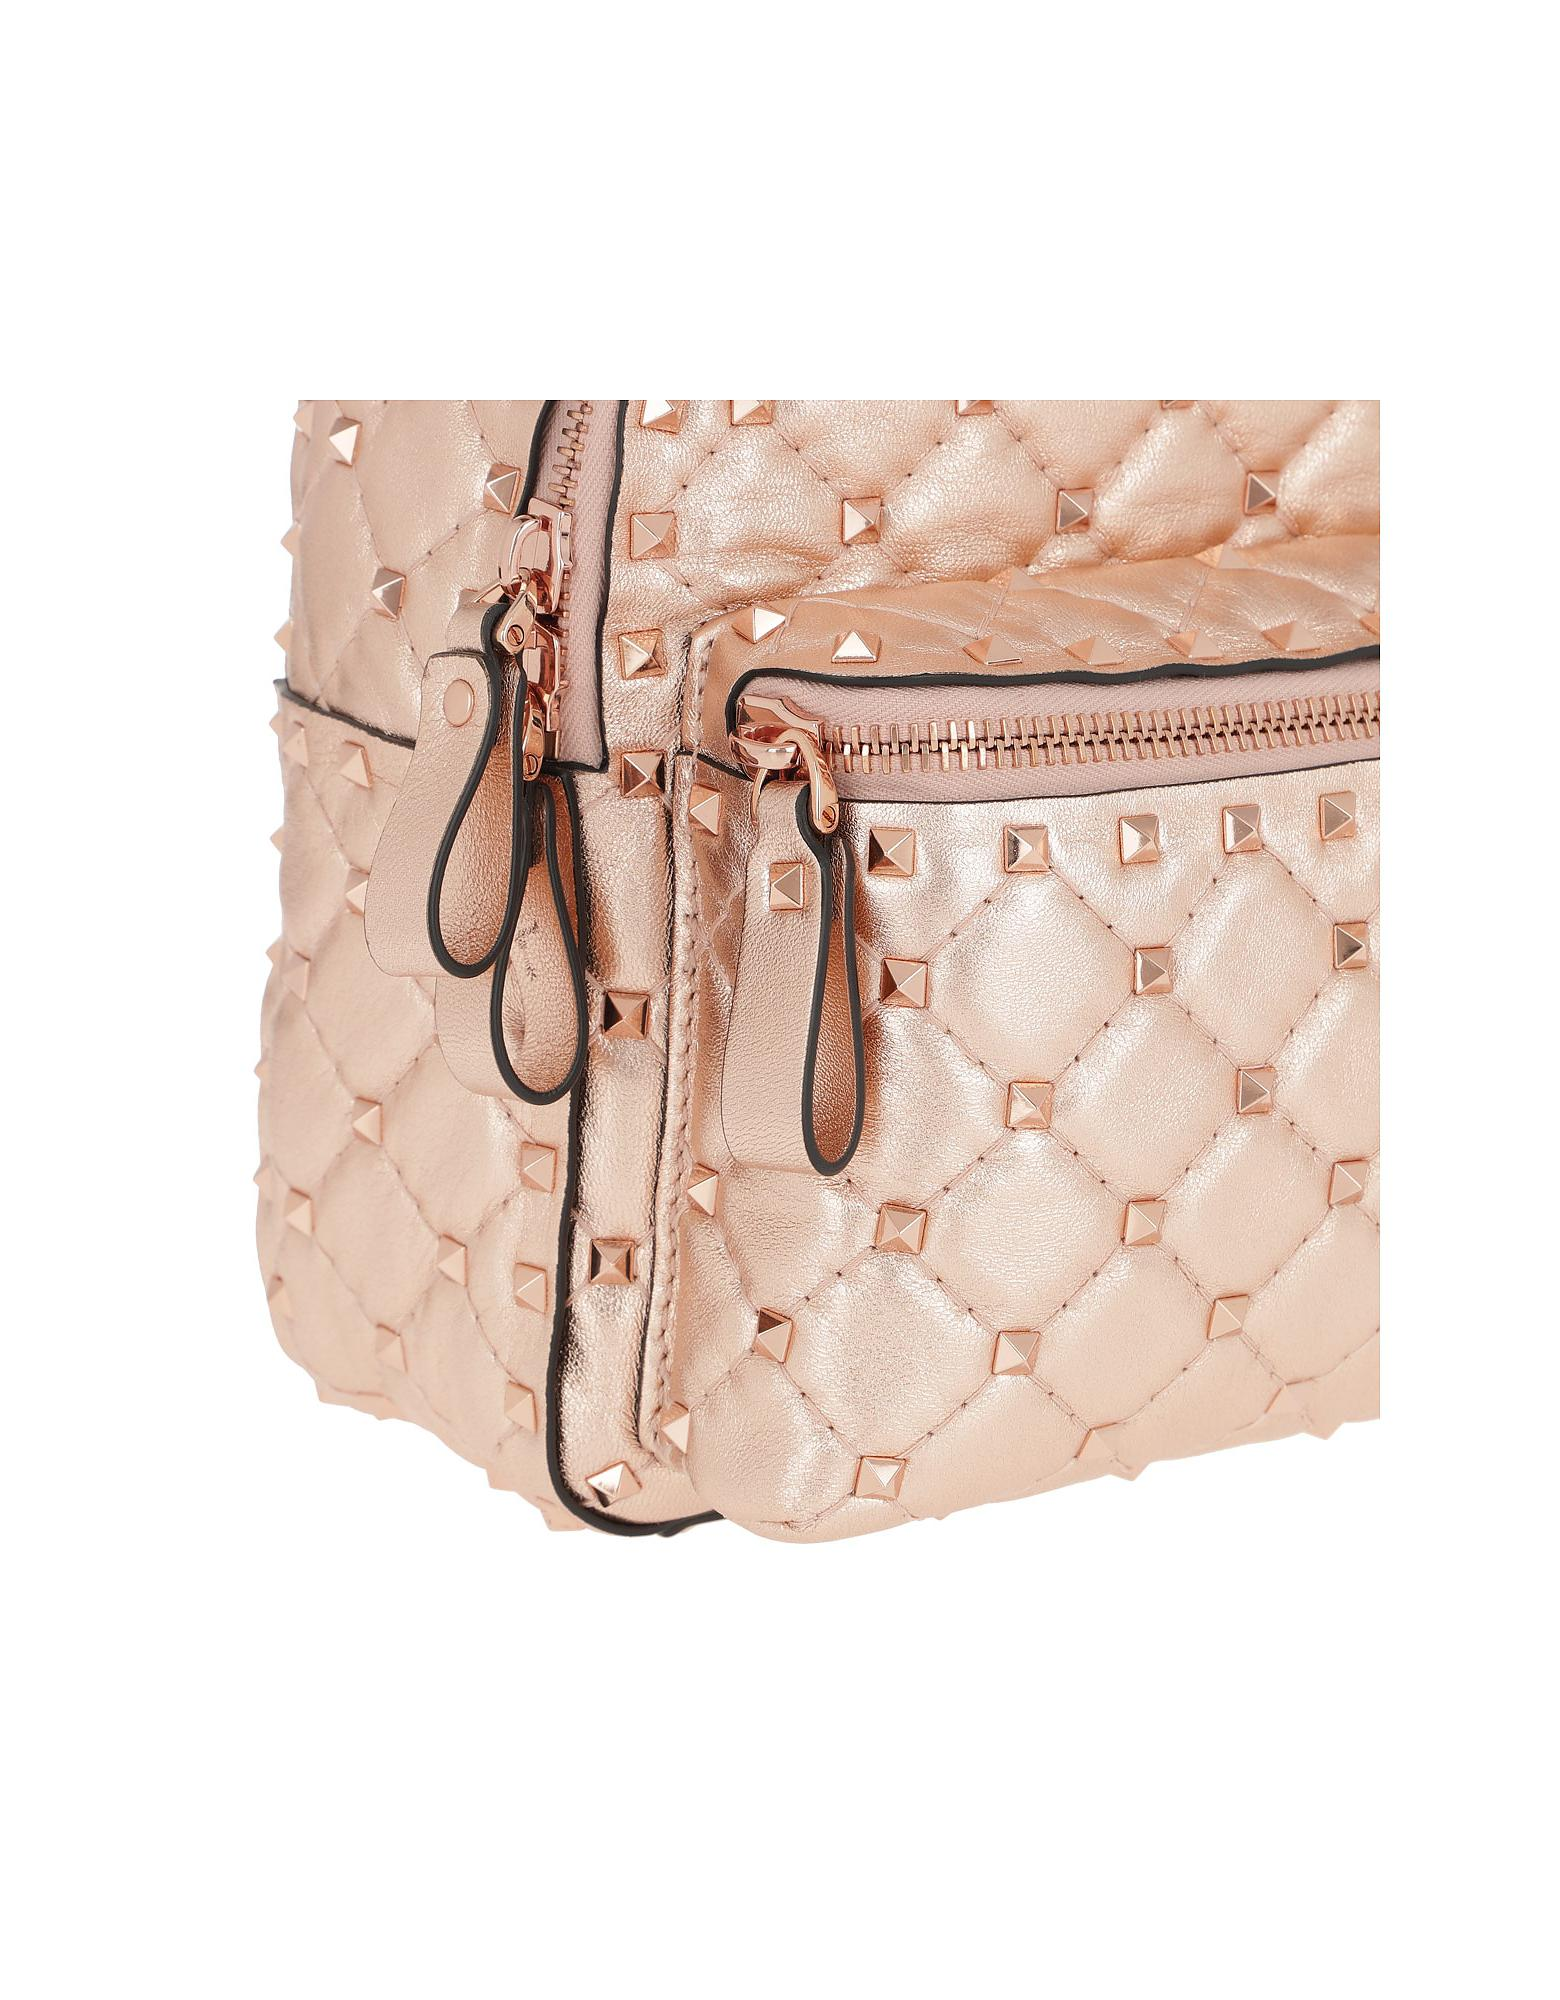 8b8da283ac64 Lyst - Valentino Rocksutd Spike Backpack Leather Beige in Pink